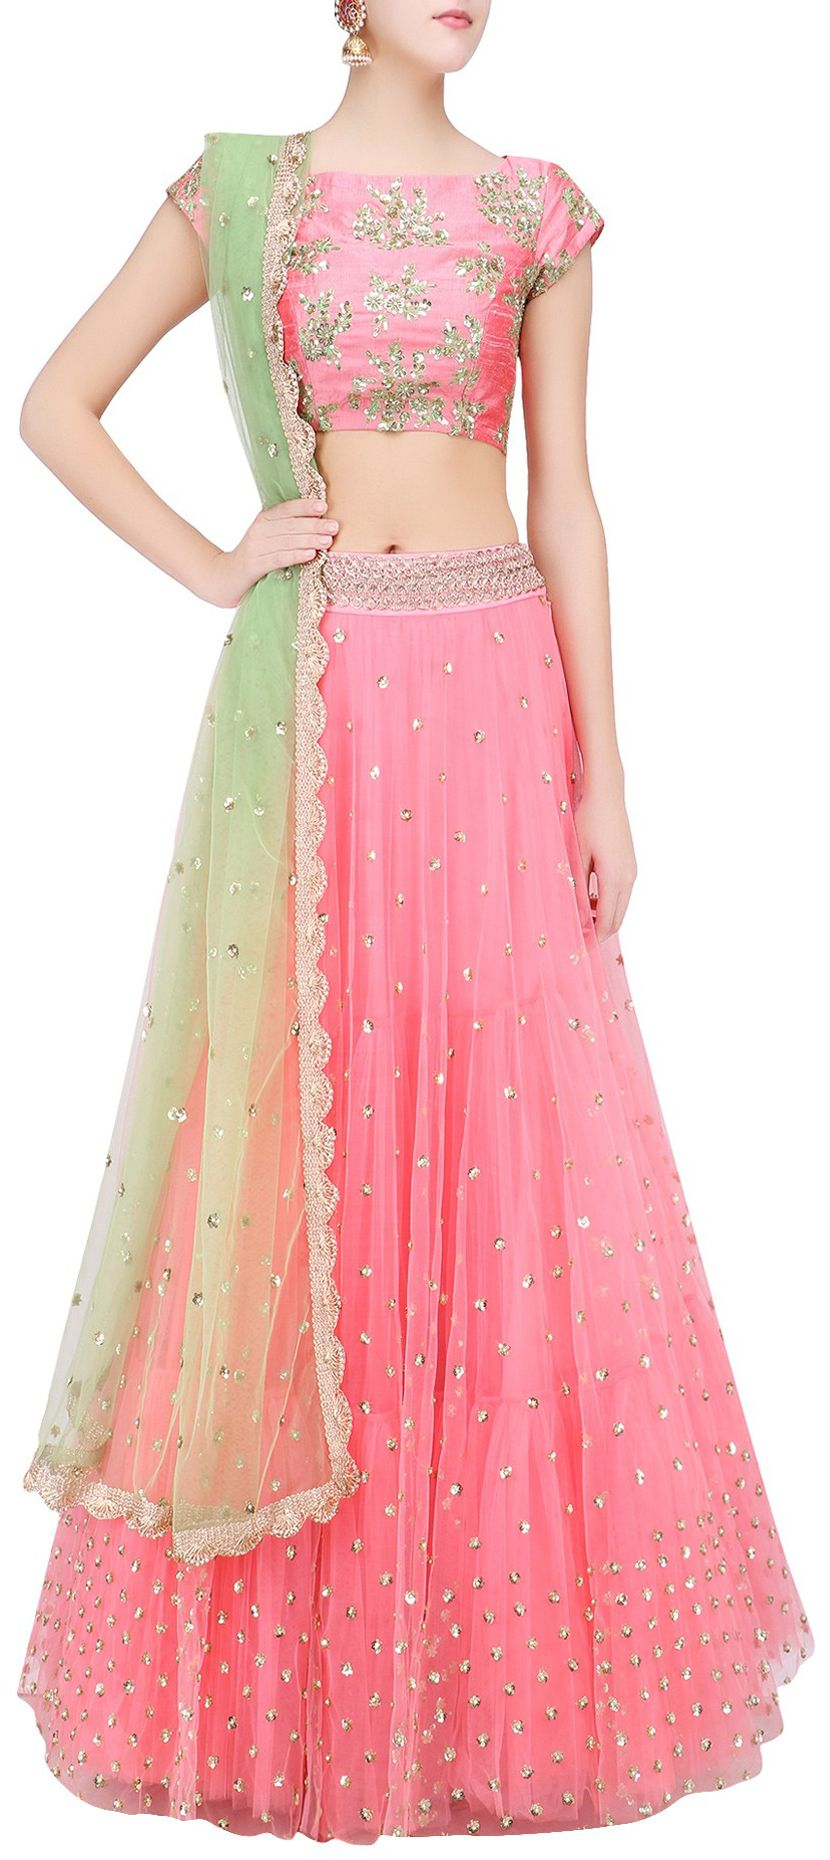 729033 Pink and Majenta color family Brides maid Lehenga, Mehendi ...